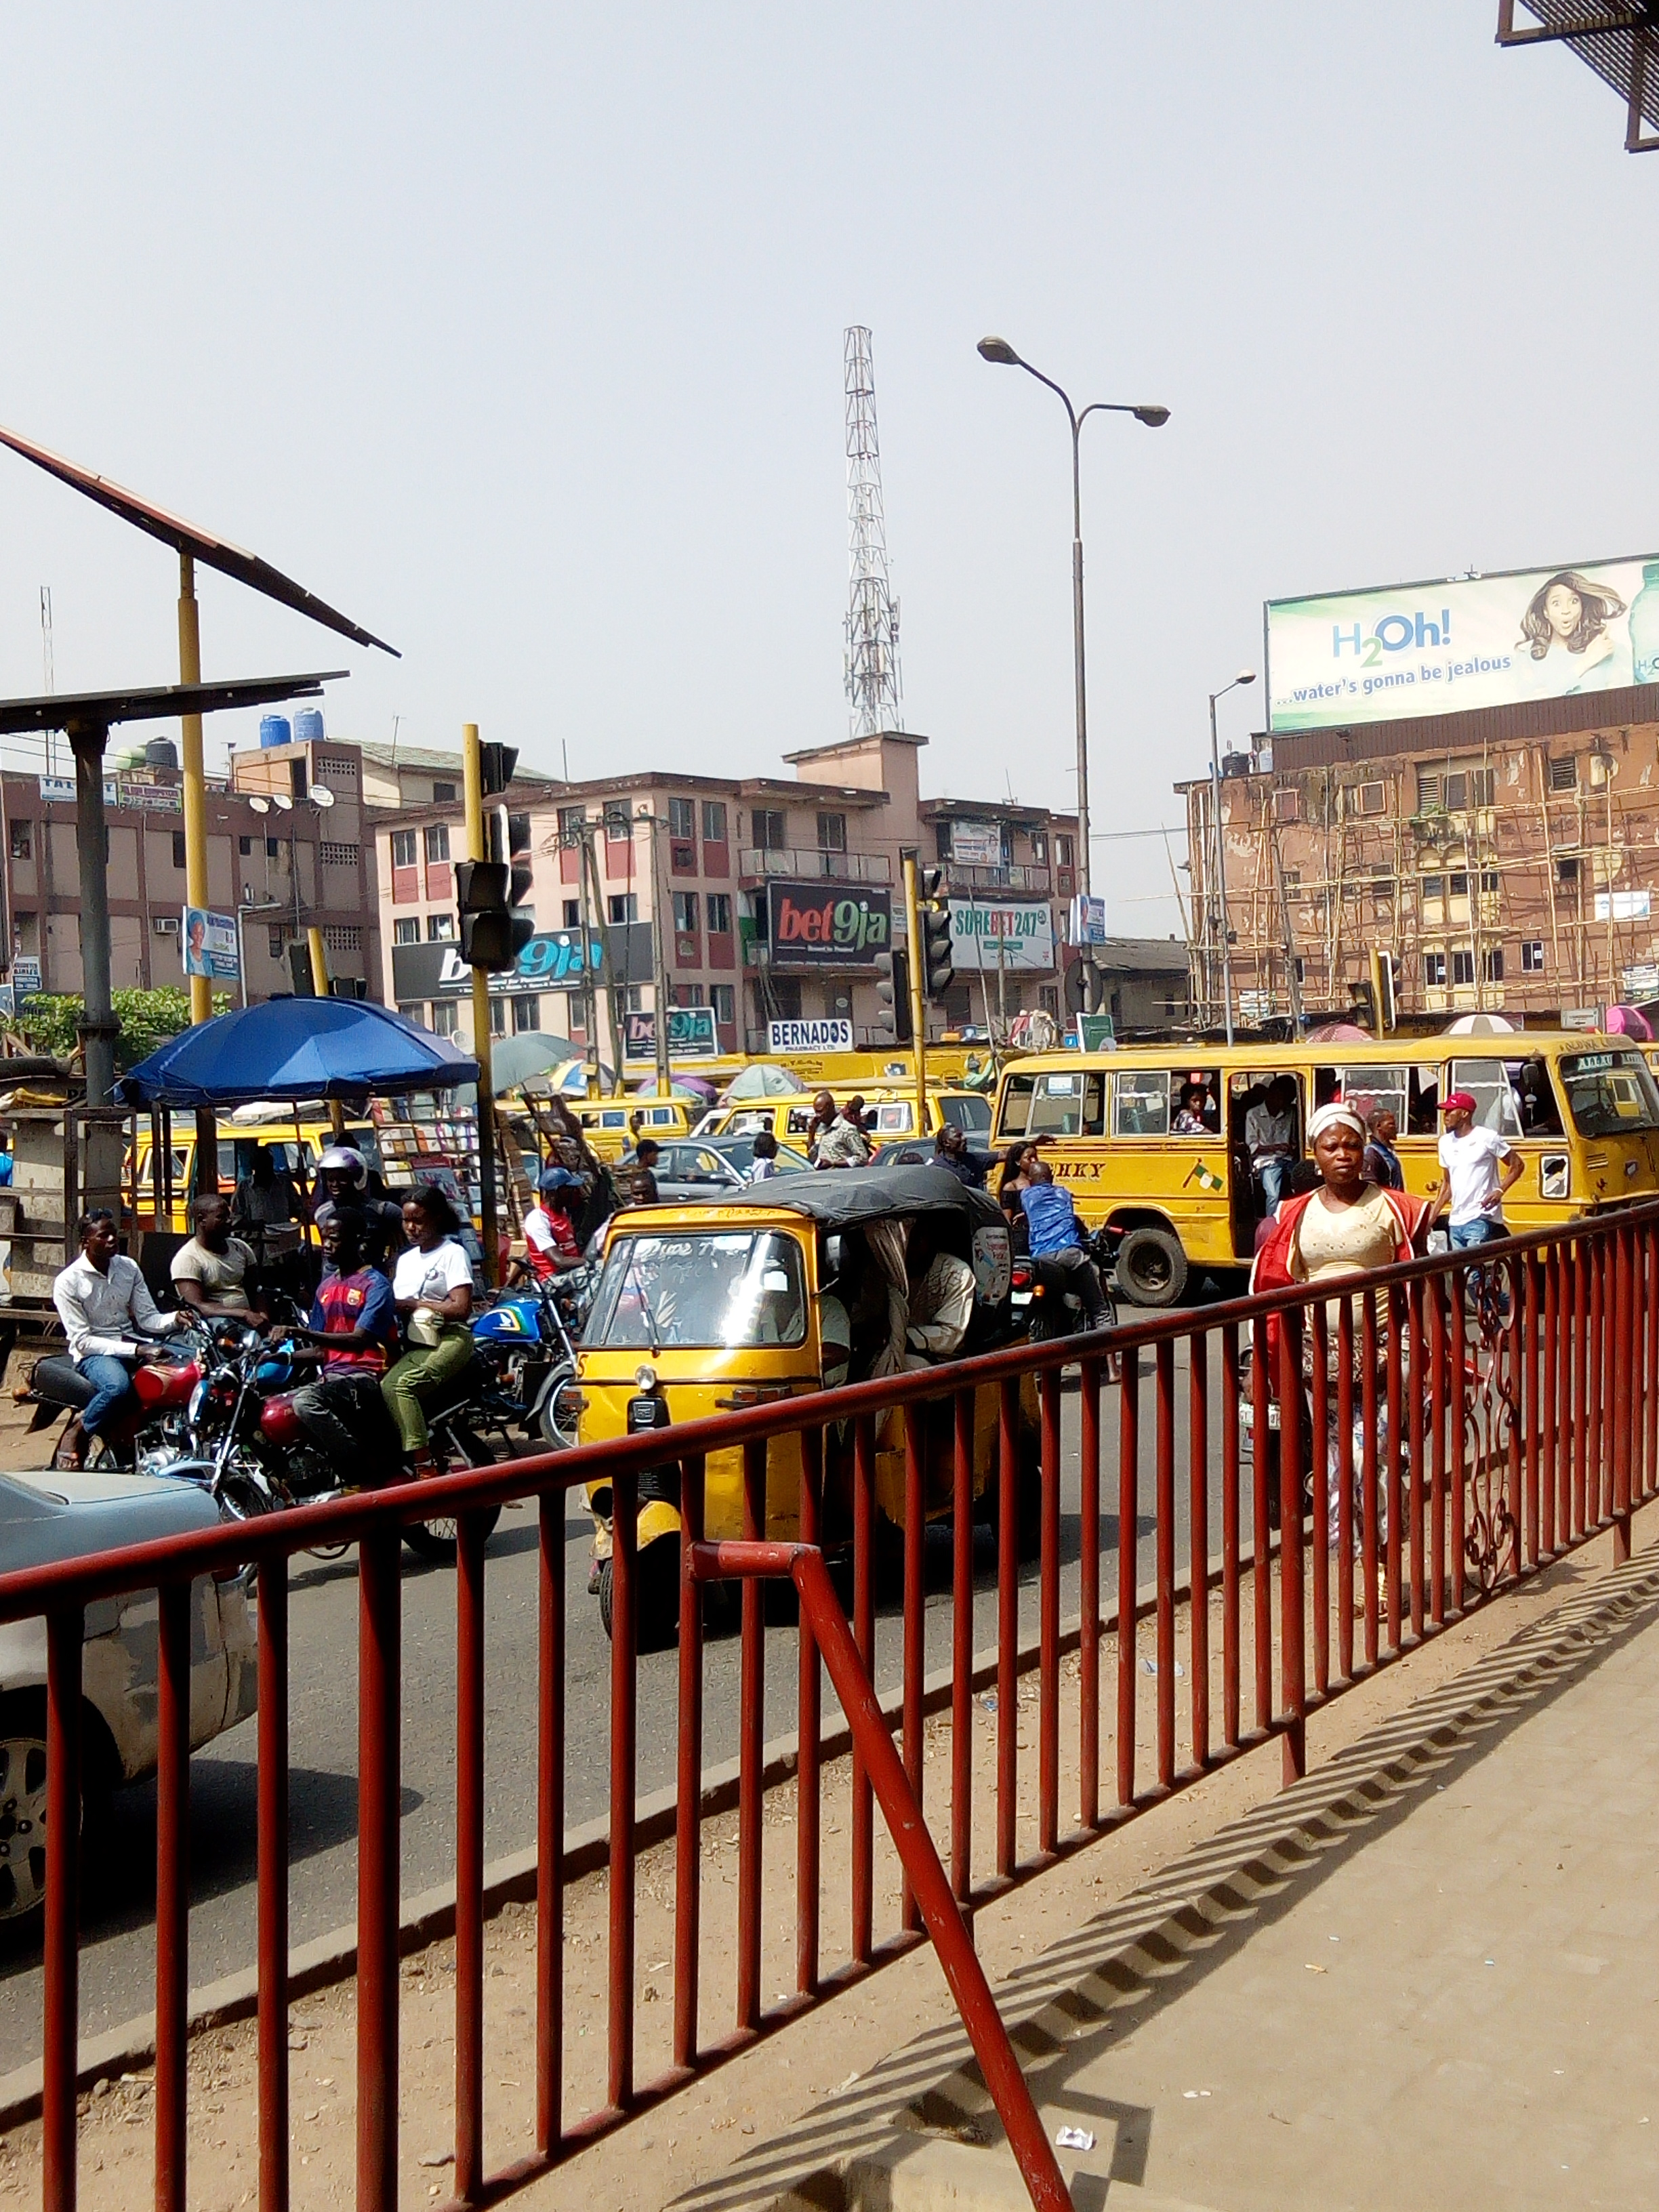 File:Ojuelegba under bridge,Surulere,Lagos jpg - Wikimedia